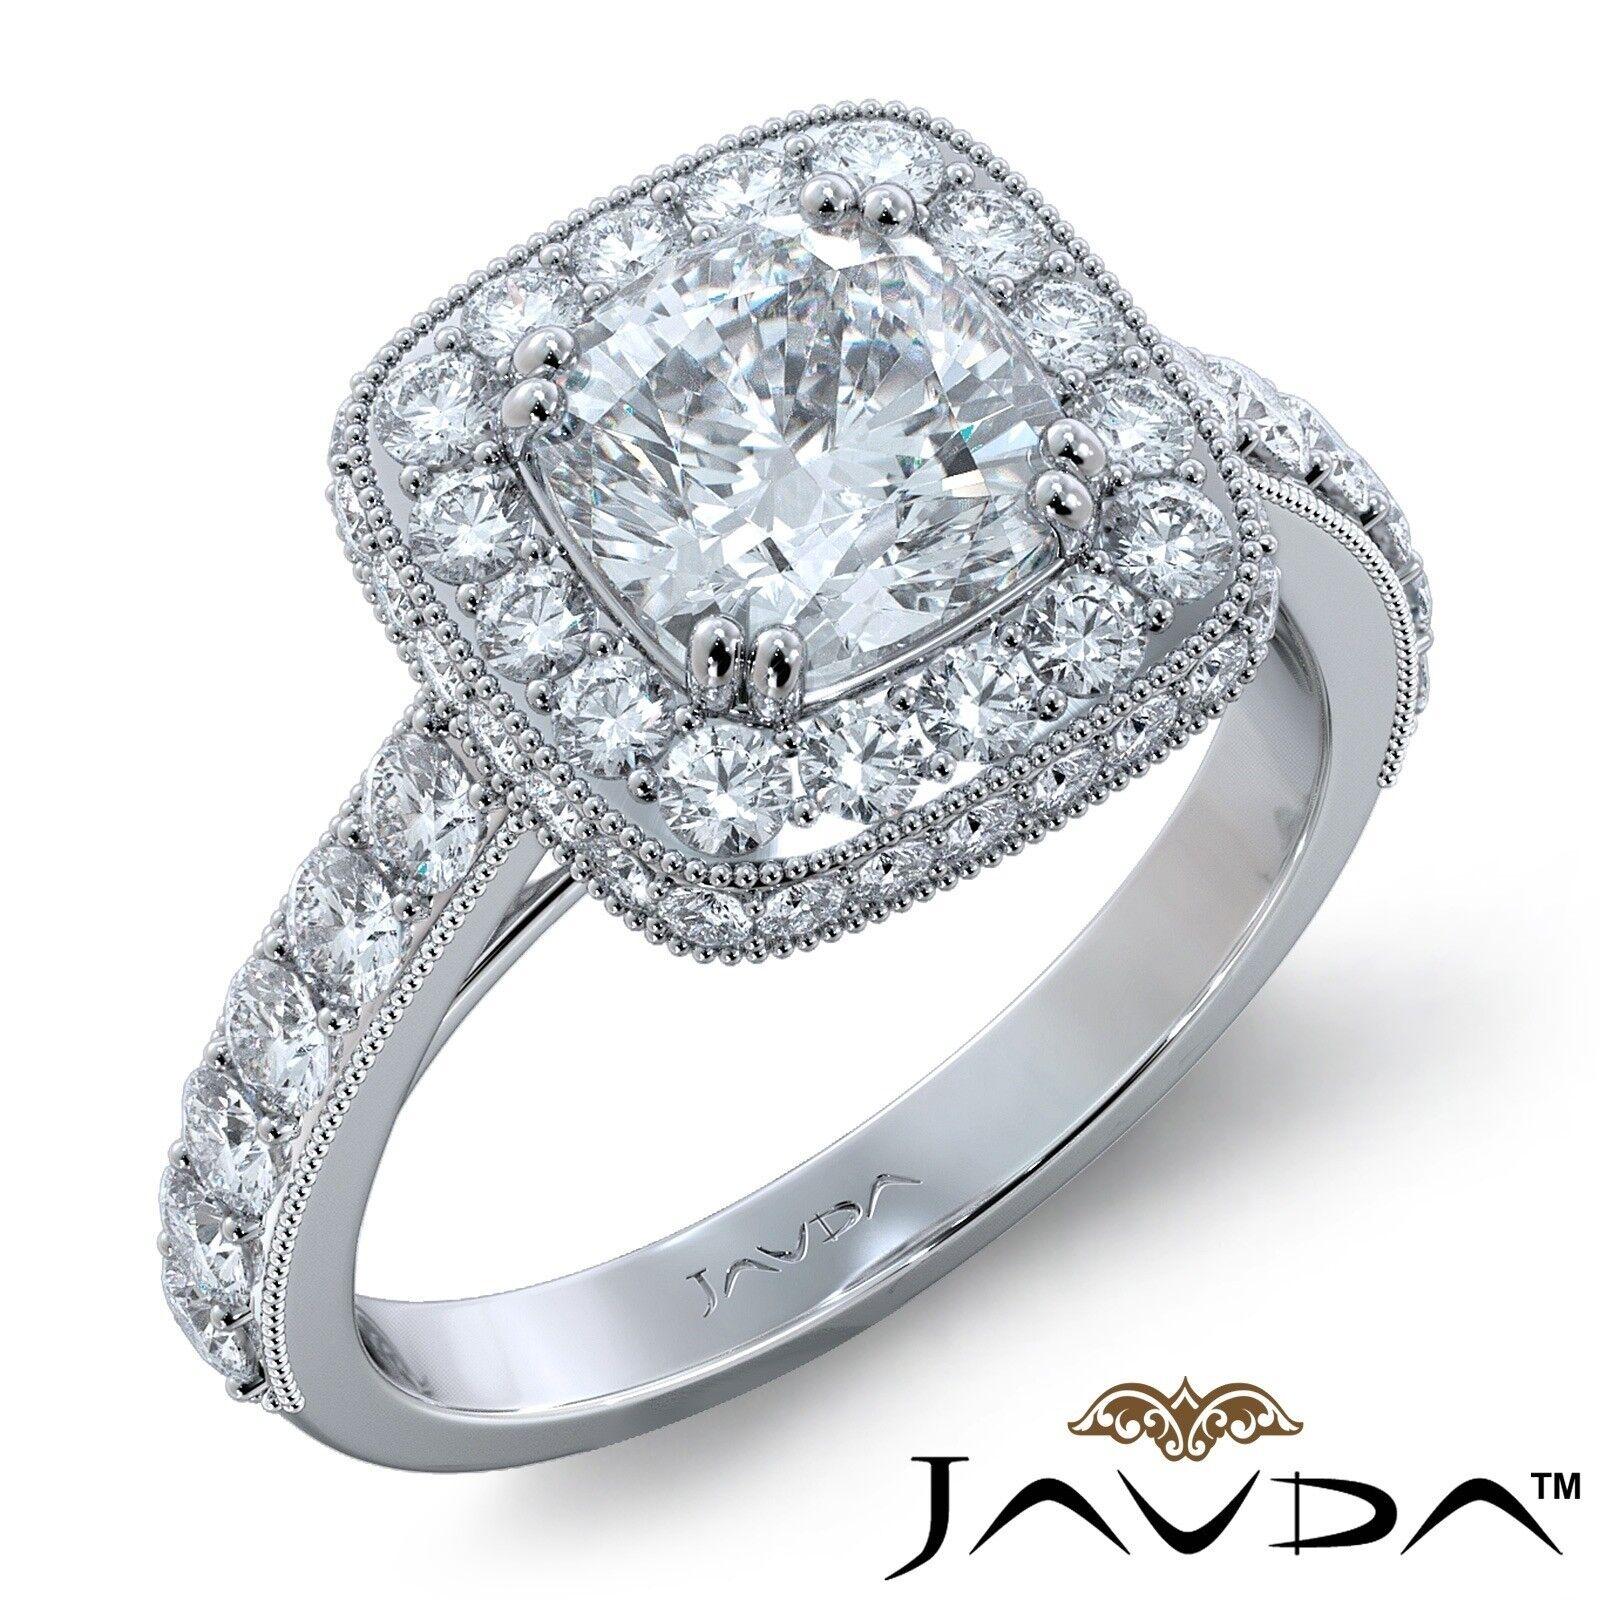 2.12ctw Milgrain Floral Basket Cushion Diamond Engagement Ring GIA I-SI2 W Gold